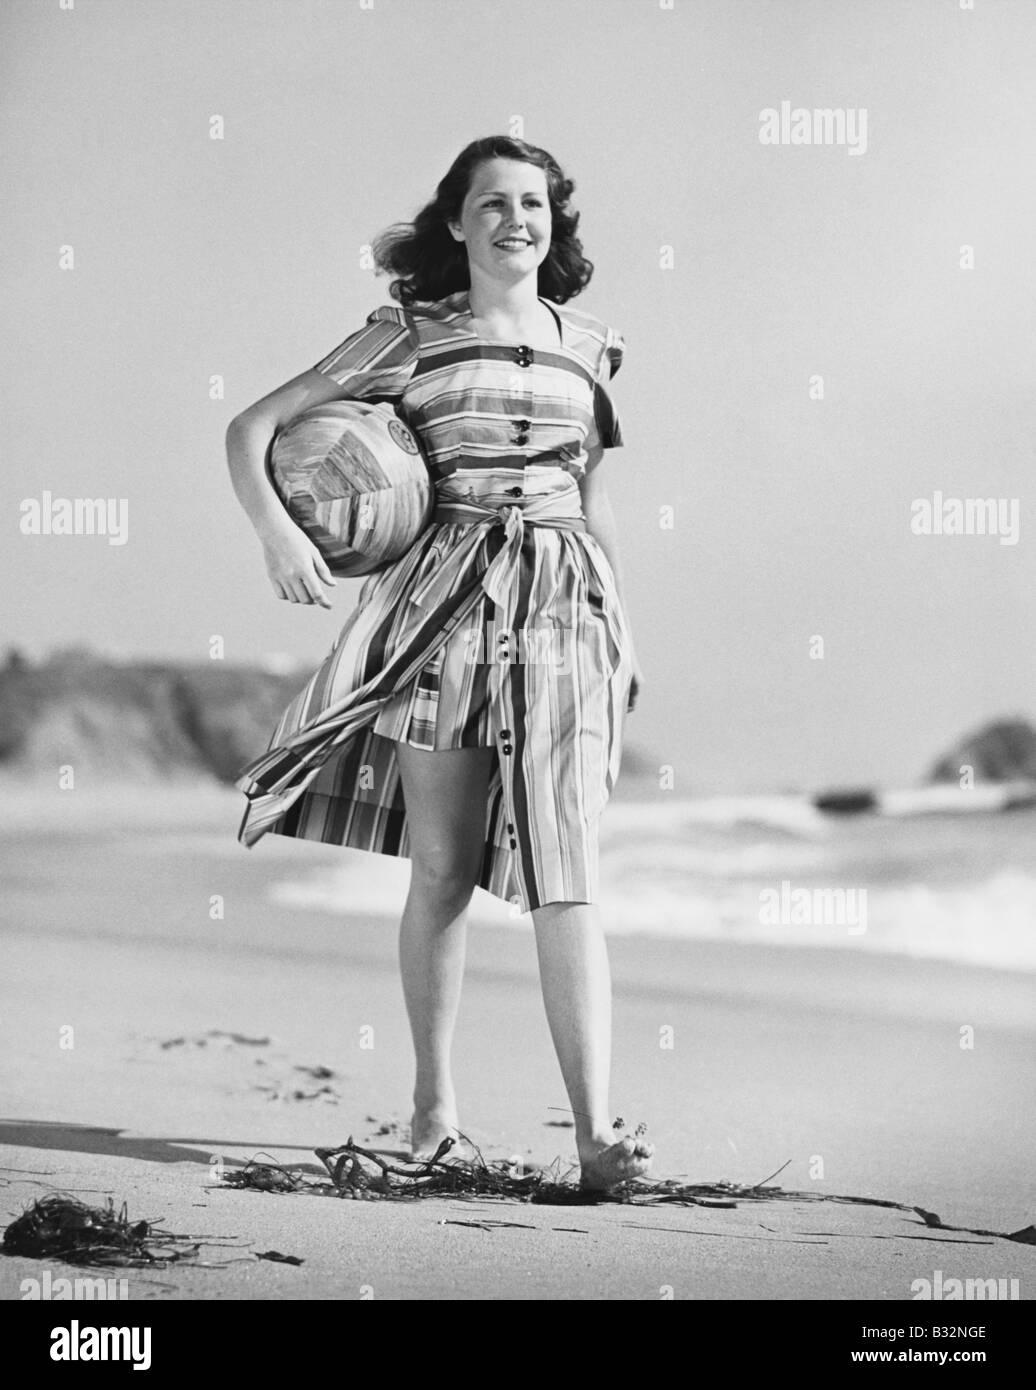 Woman walking on beach carrying ball Stock Photo